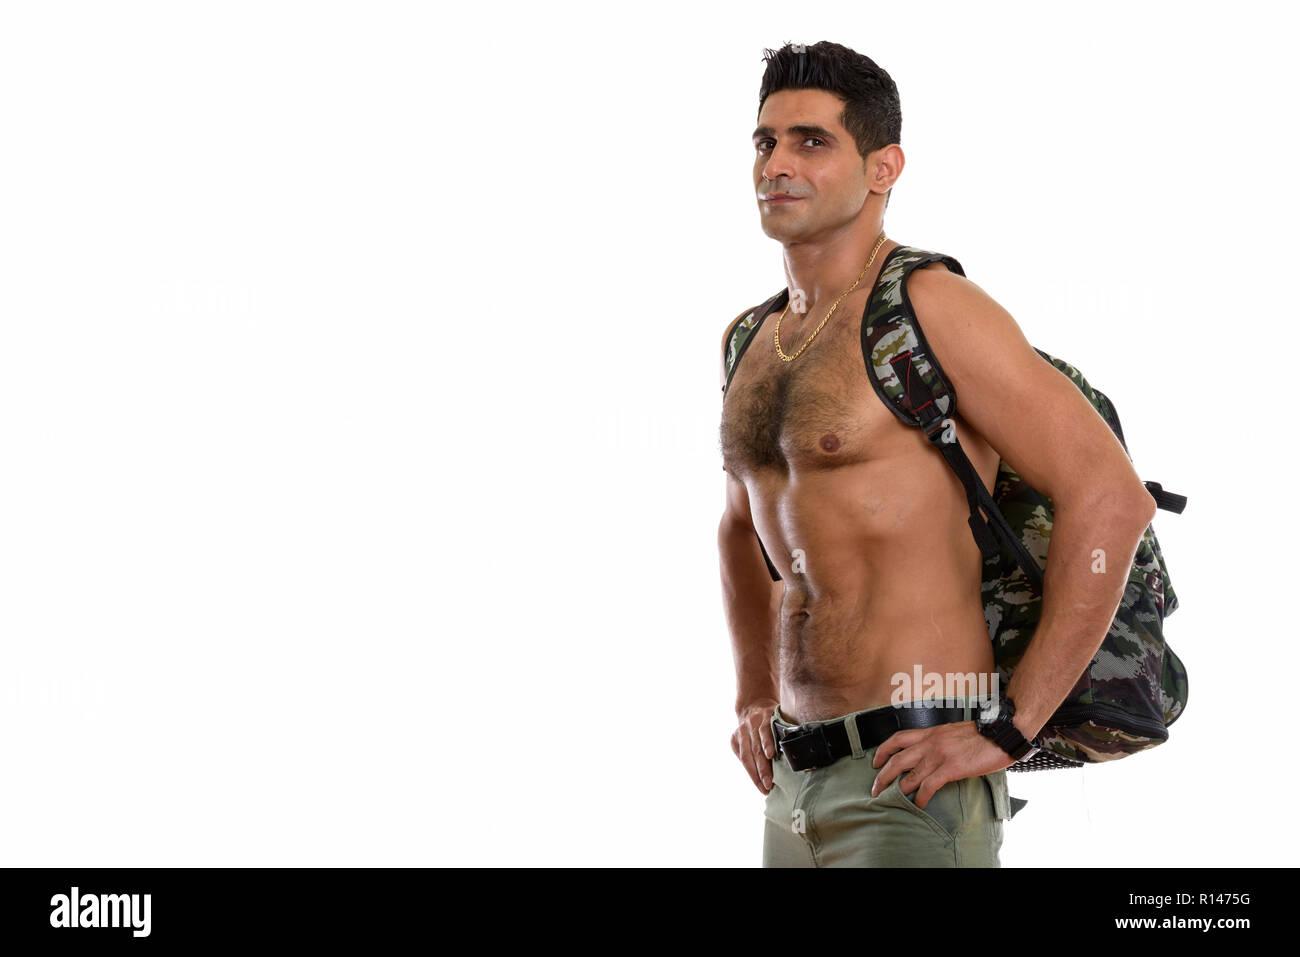 site web pour réduction modélisation durable prix raisonnable Hairy Shirtless Man Photos & Hairy Shirtless Man Images - Alamy